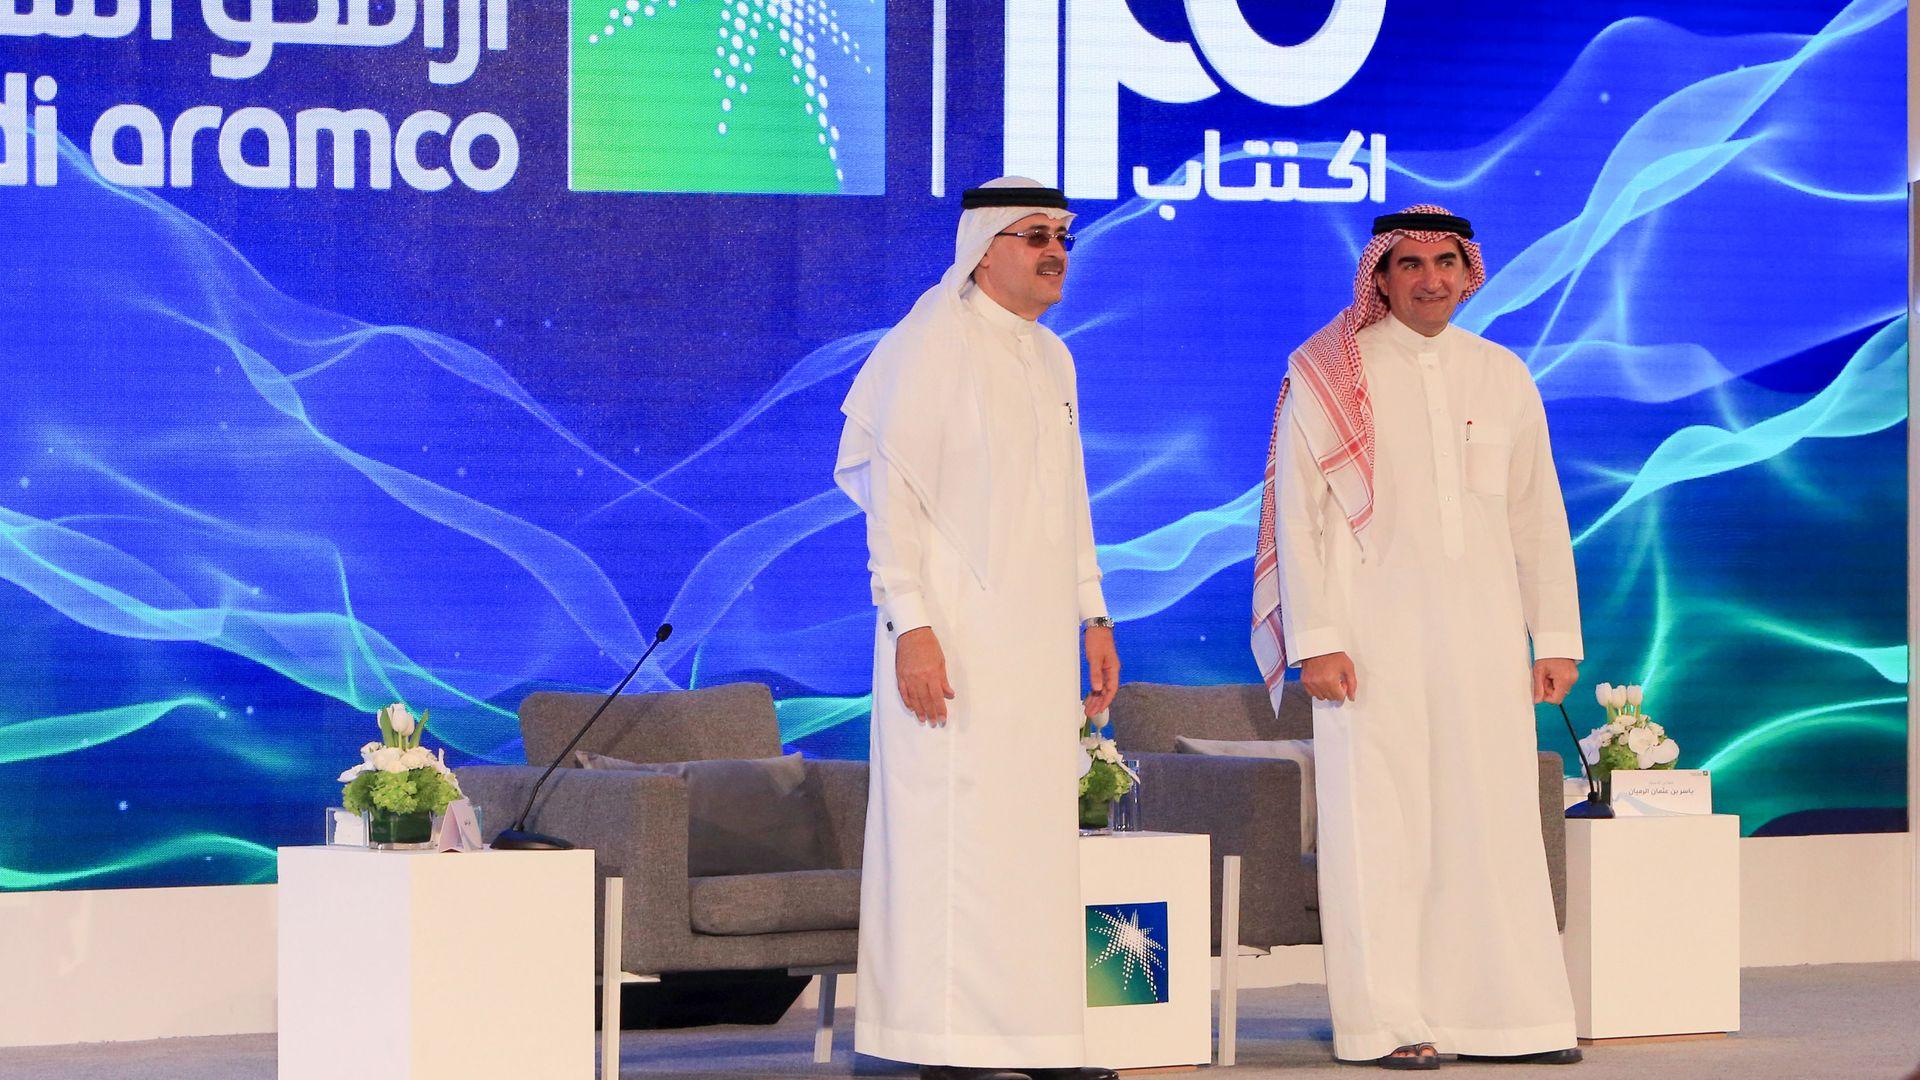 President and CEO of Saudi Aramco Amin Nasser (left), and Aramco's chairman Yasir al-Rumayyan (right).